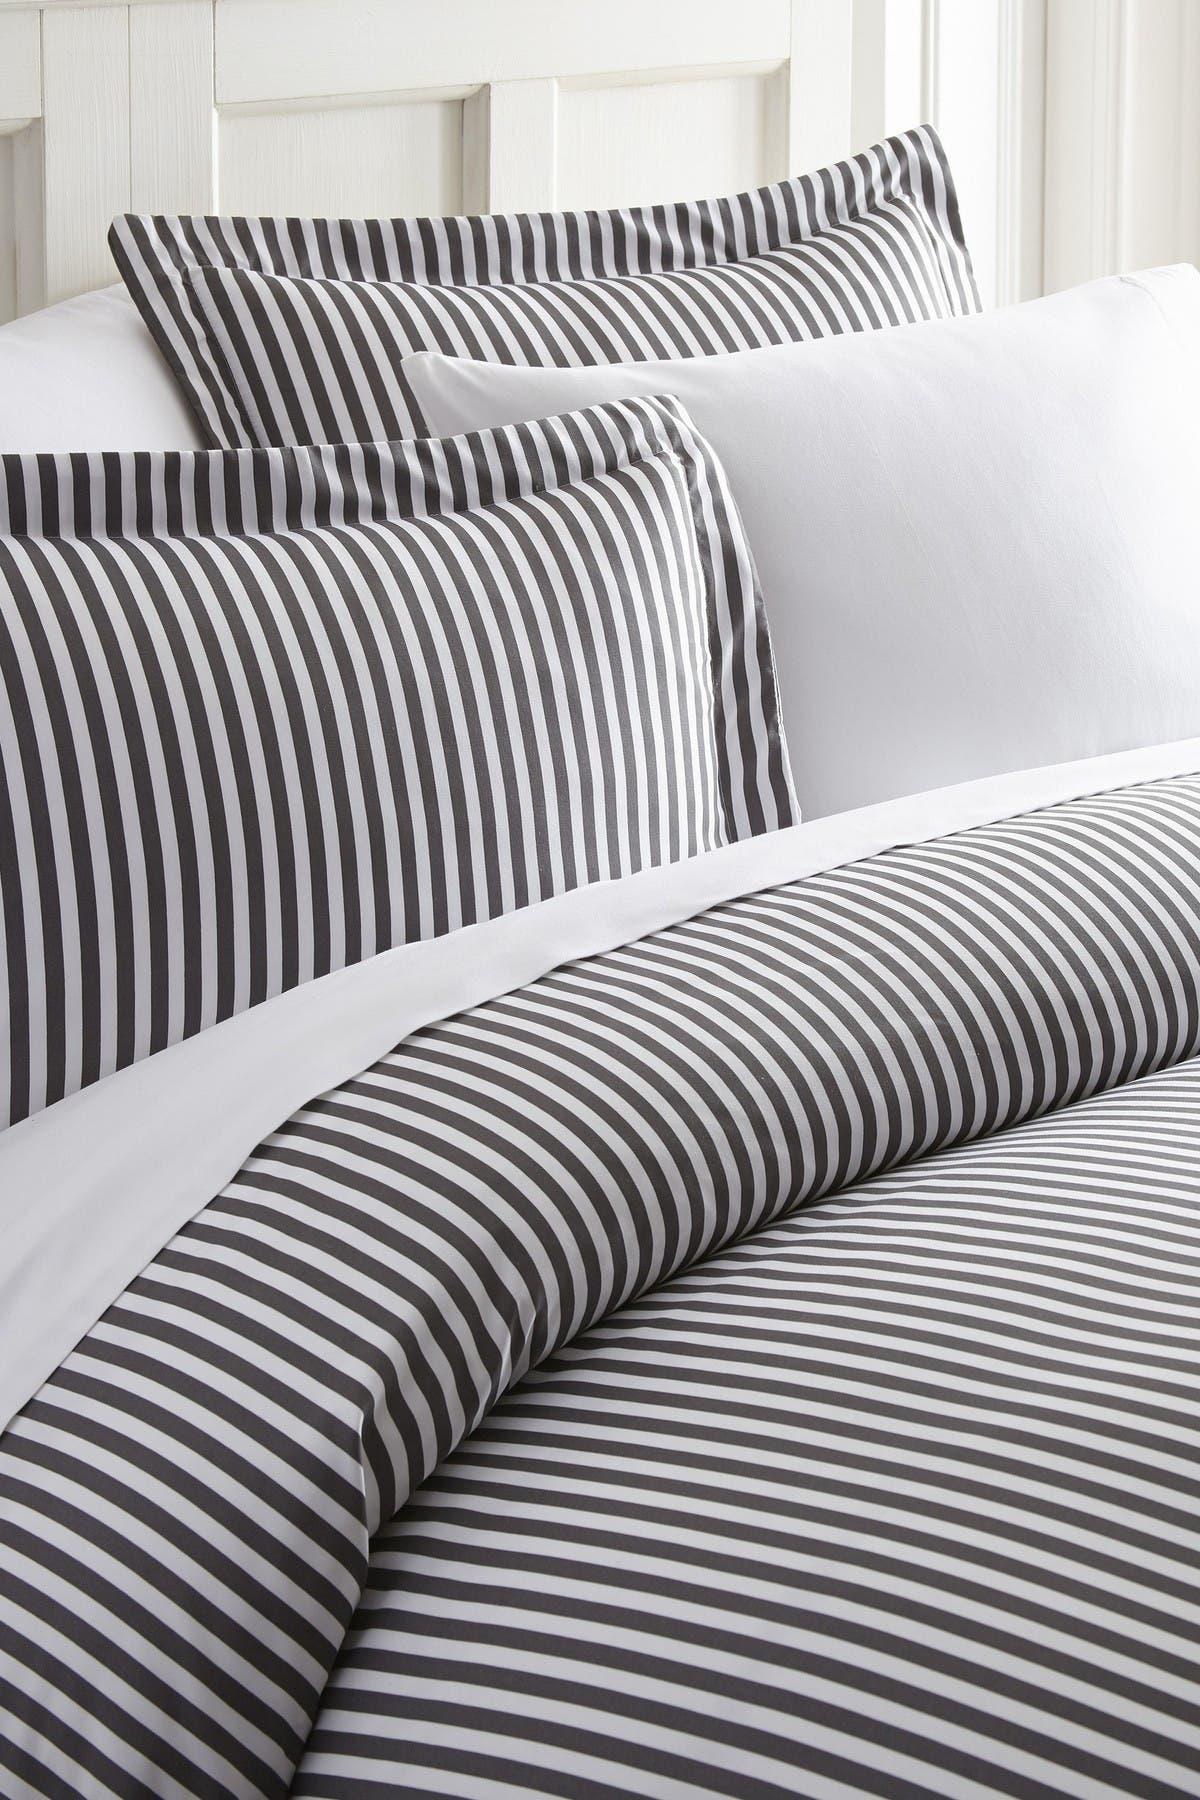 Image of IENJOY HOME Home Spun Premium Ultra Soft Ribbon Pattern 2-Piece Duvet Cover Twin Set - Gray